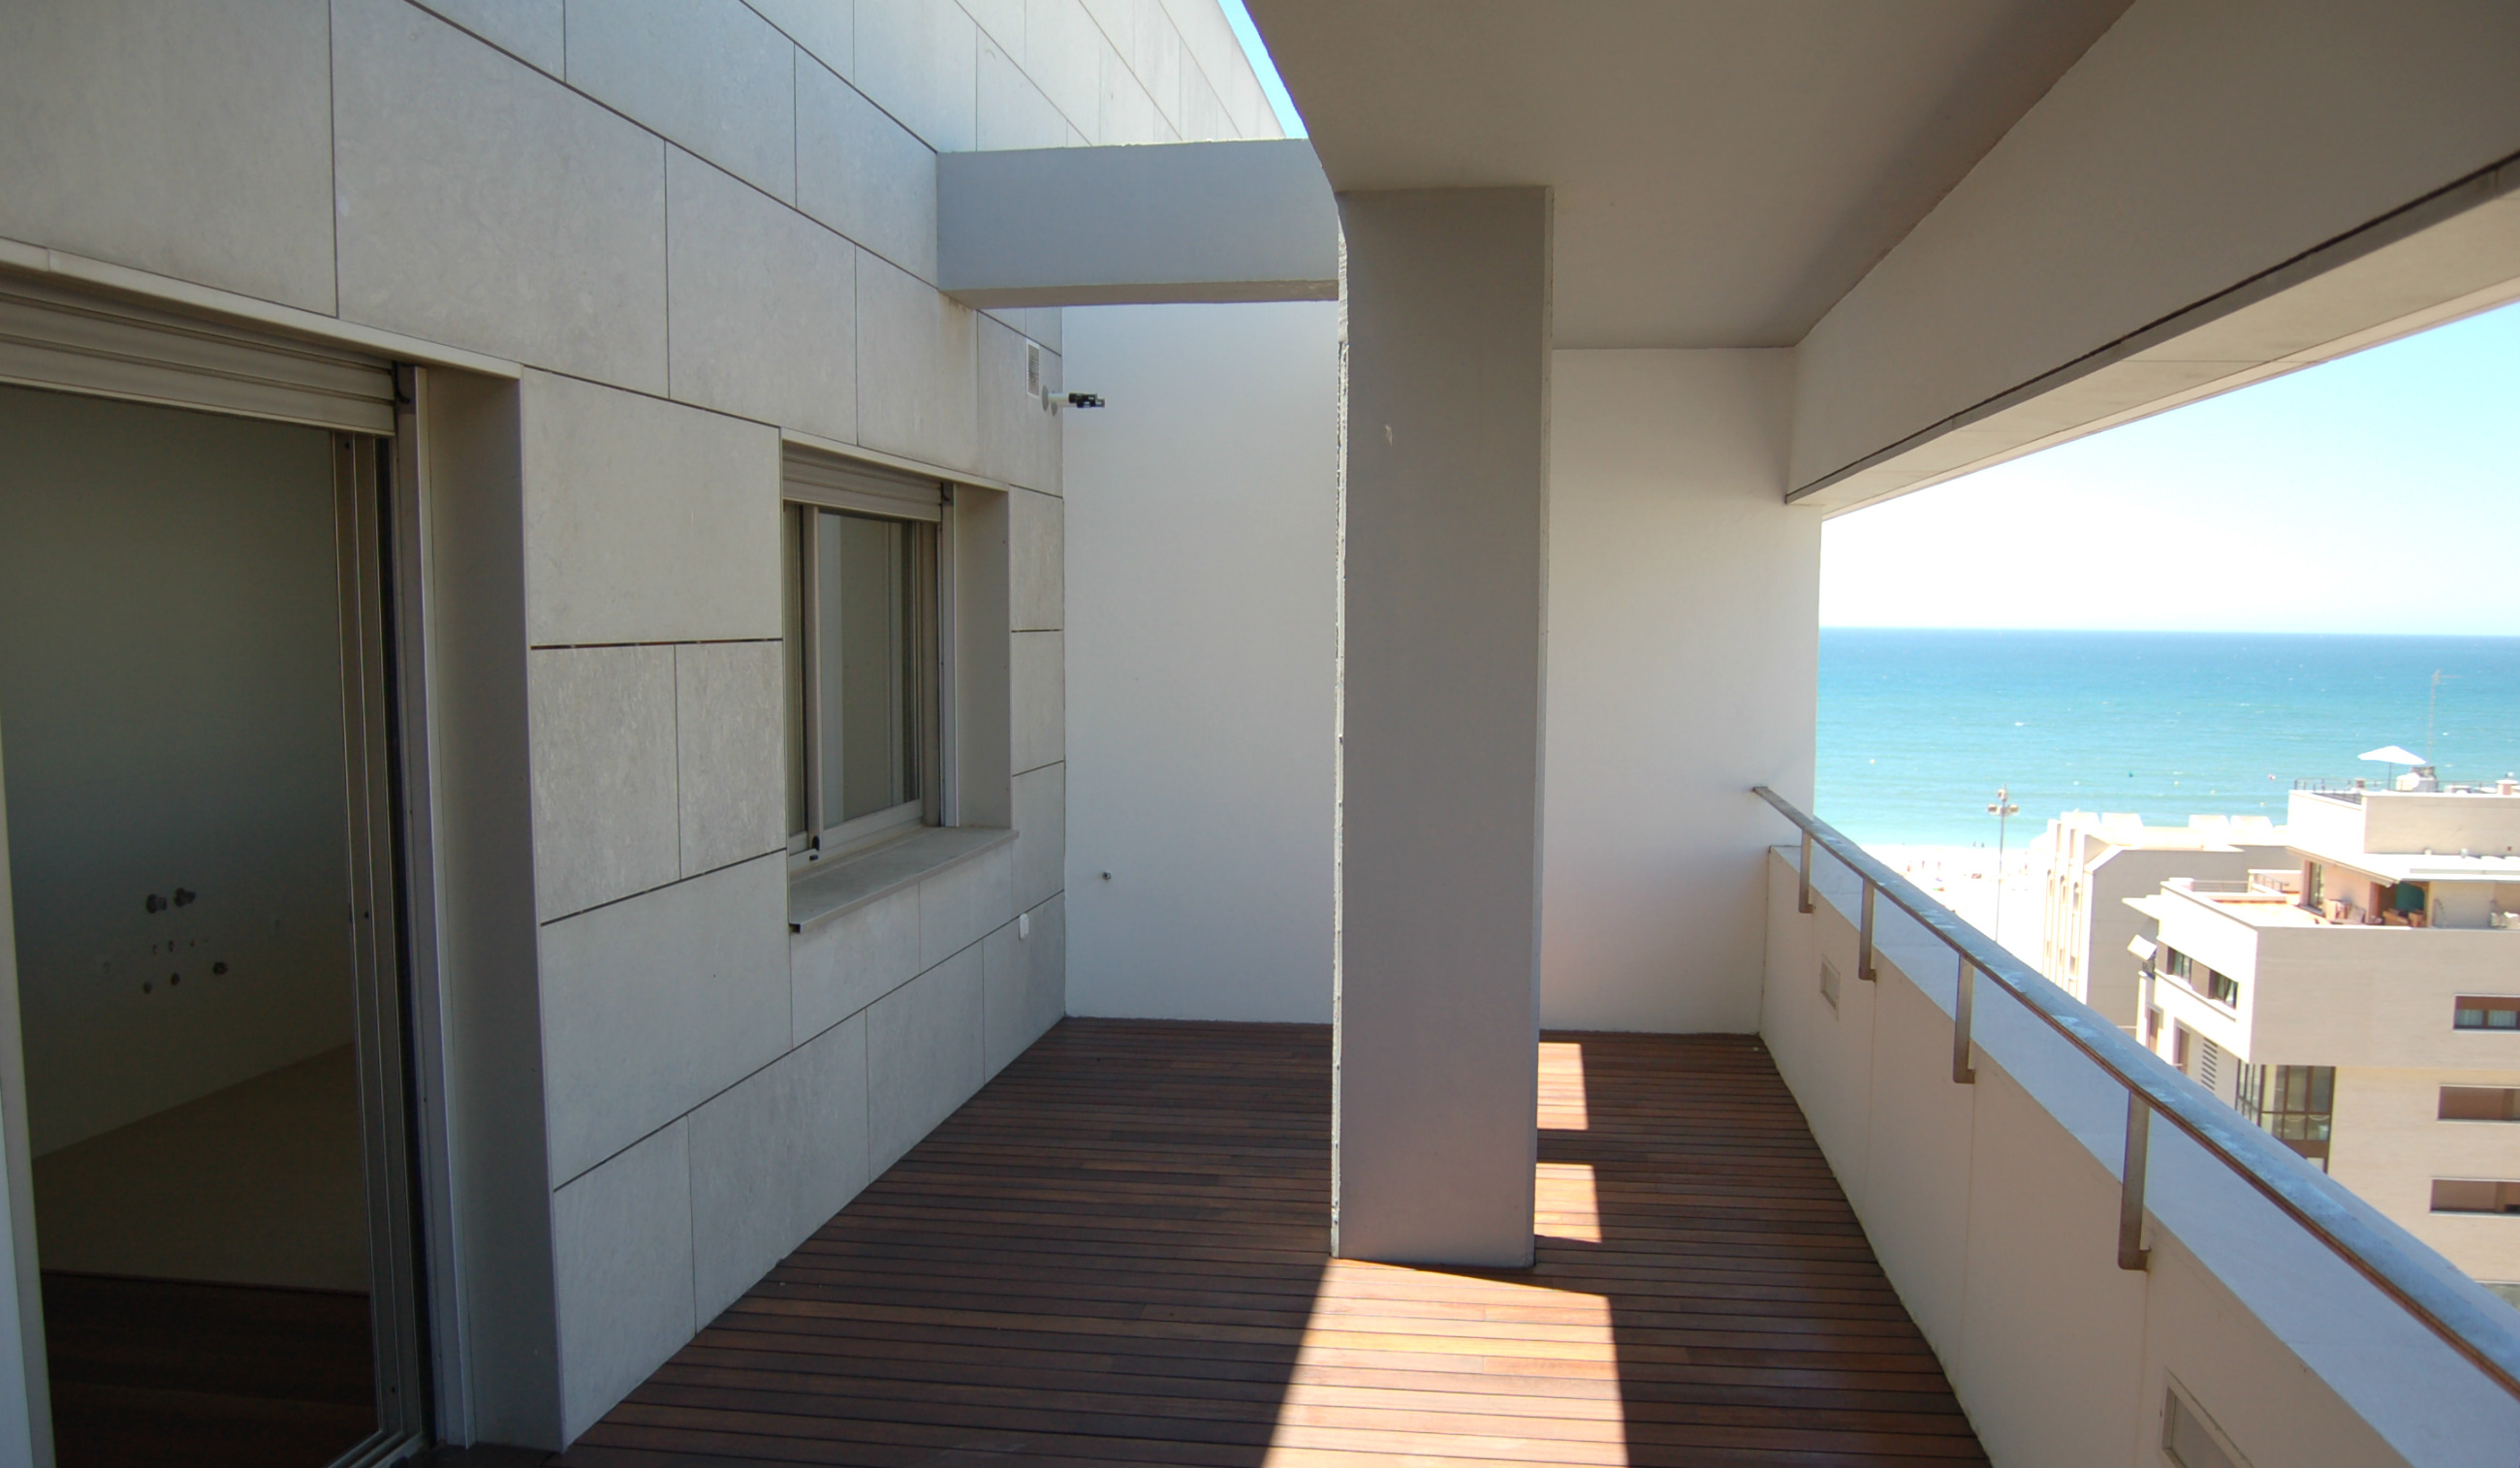 Arquitectura Cadiz, Sevilla, Malaga, Andalusia, Spain